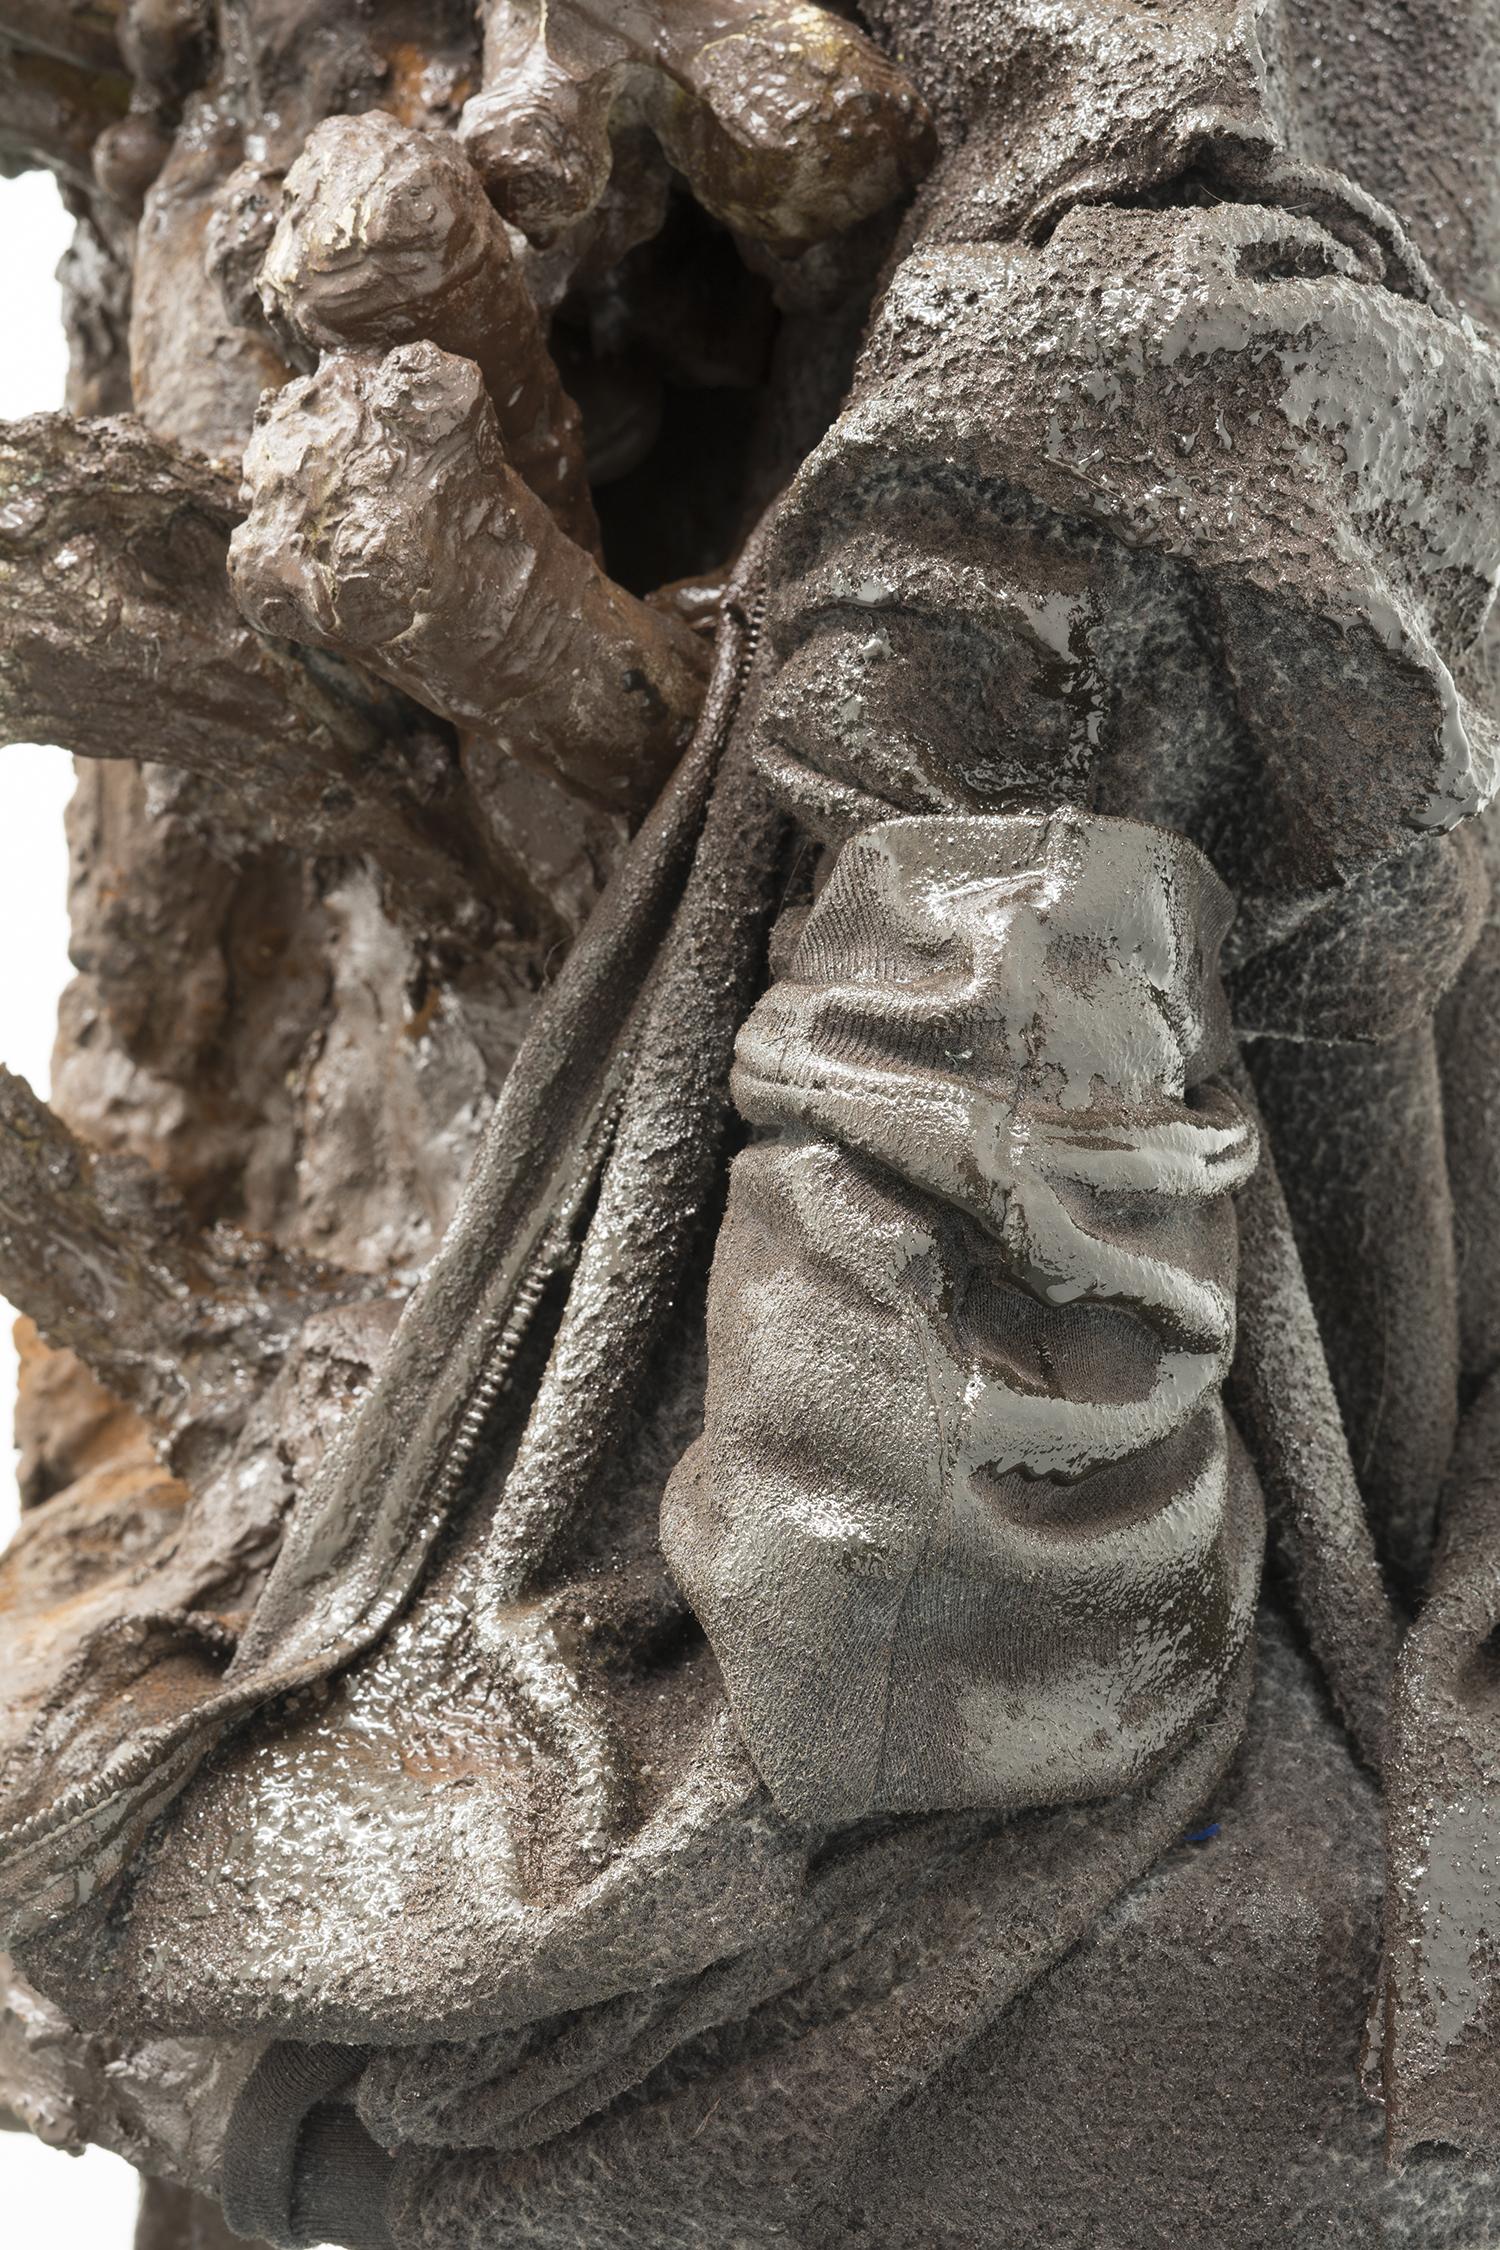 Brandon C Ndife,   The Gleaner  (detail), 2018, Cast hydrocal, resin, raw pigment, hooded sweatshirt, steel pipe, 62 × 19 × 17 in